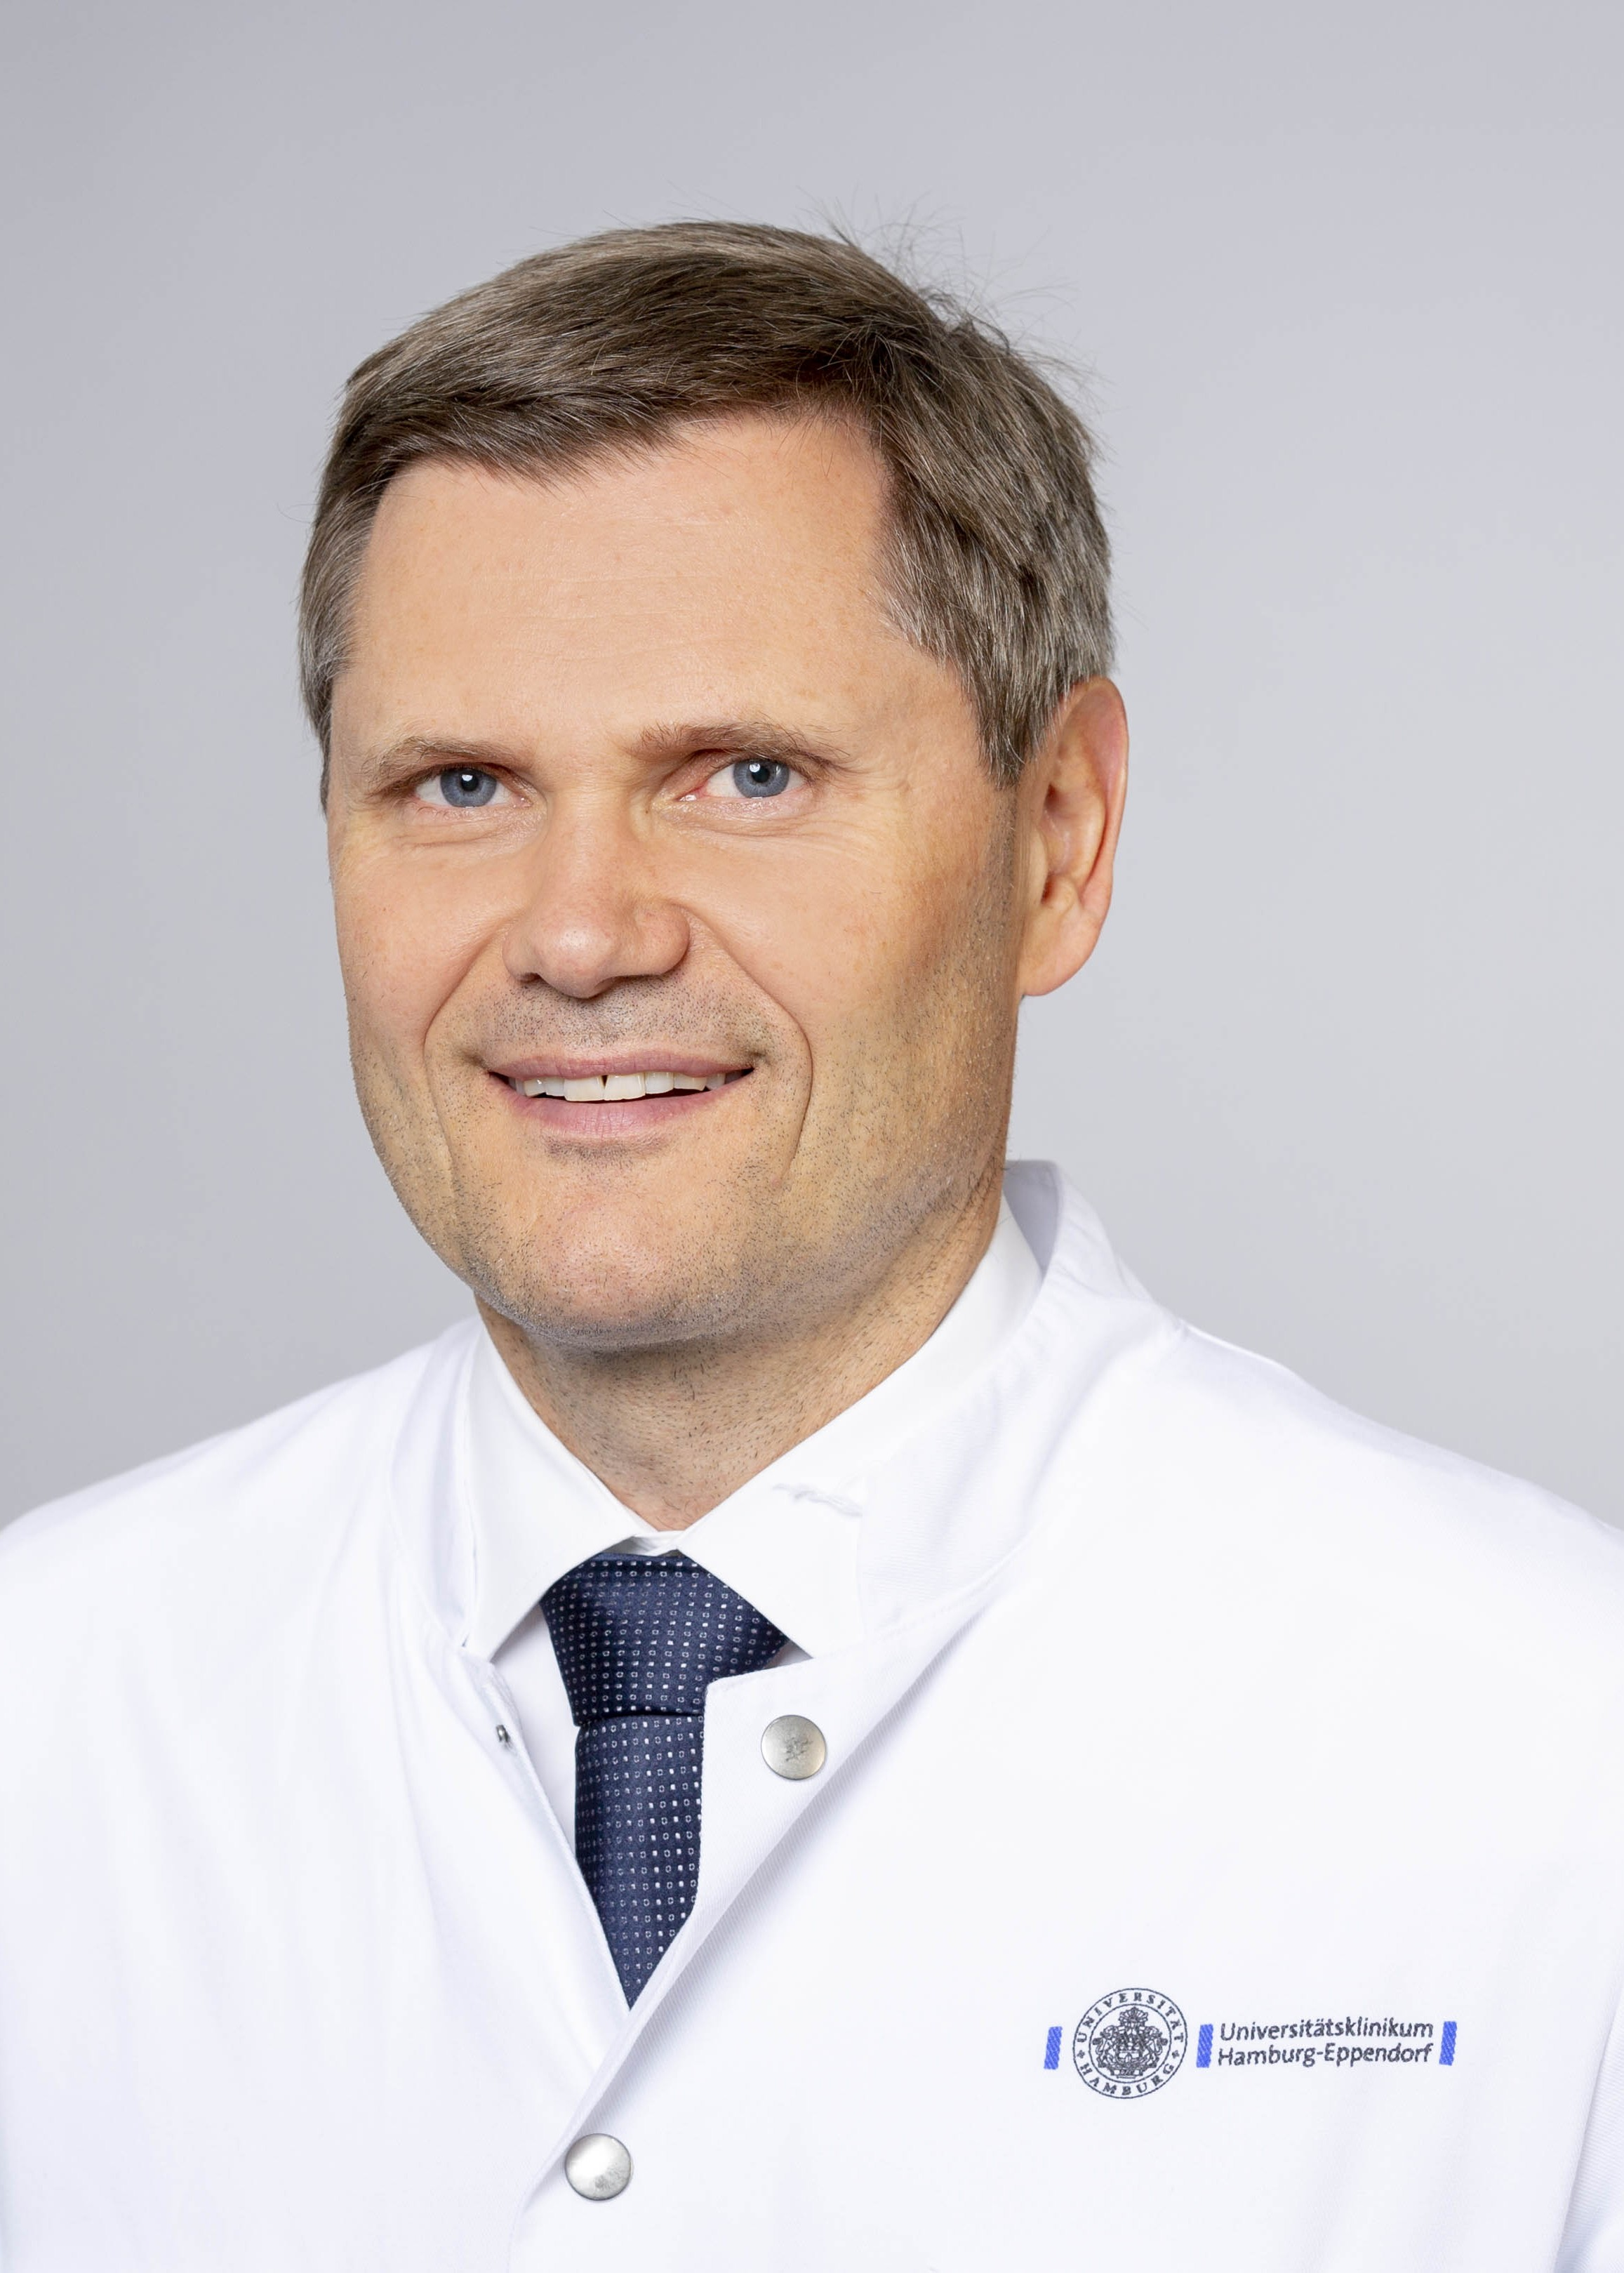 Prof. Dr. med. Karl-Heinz Frosch